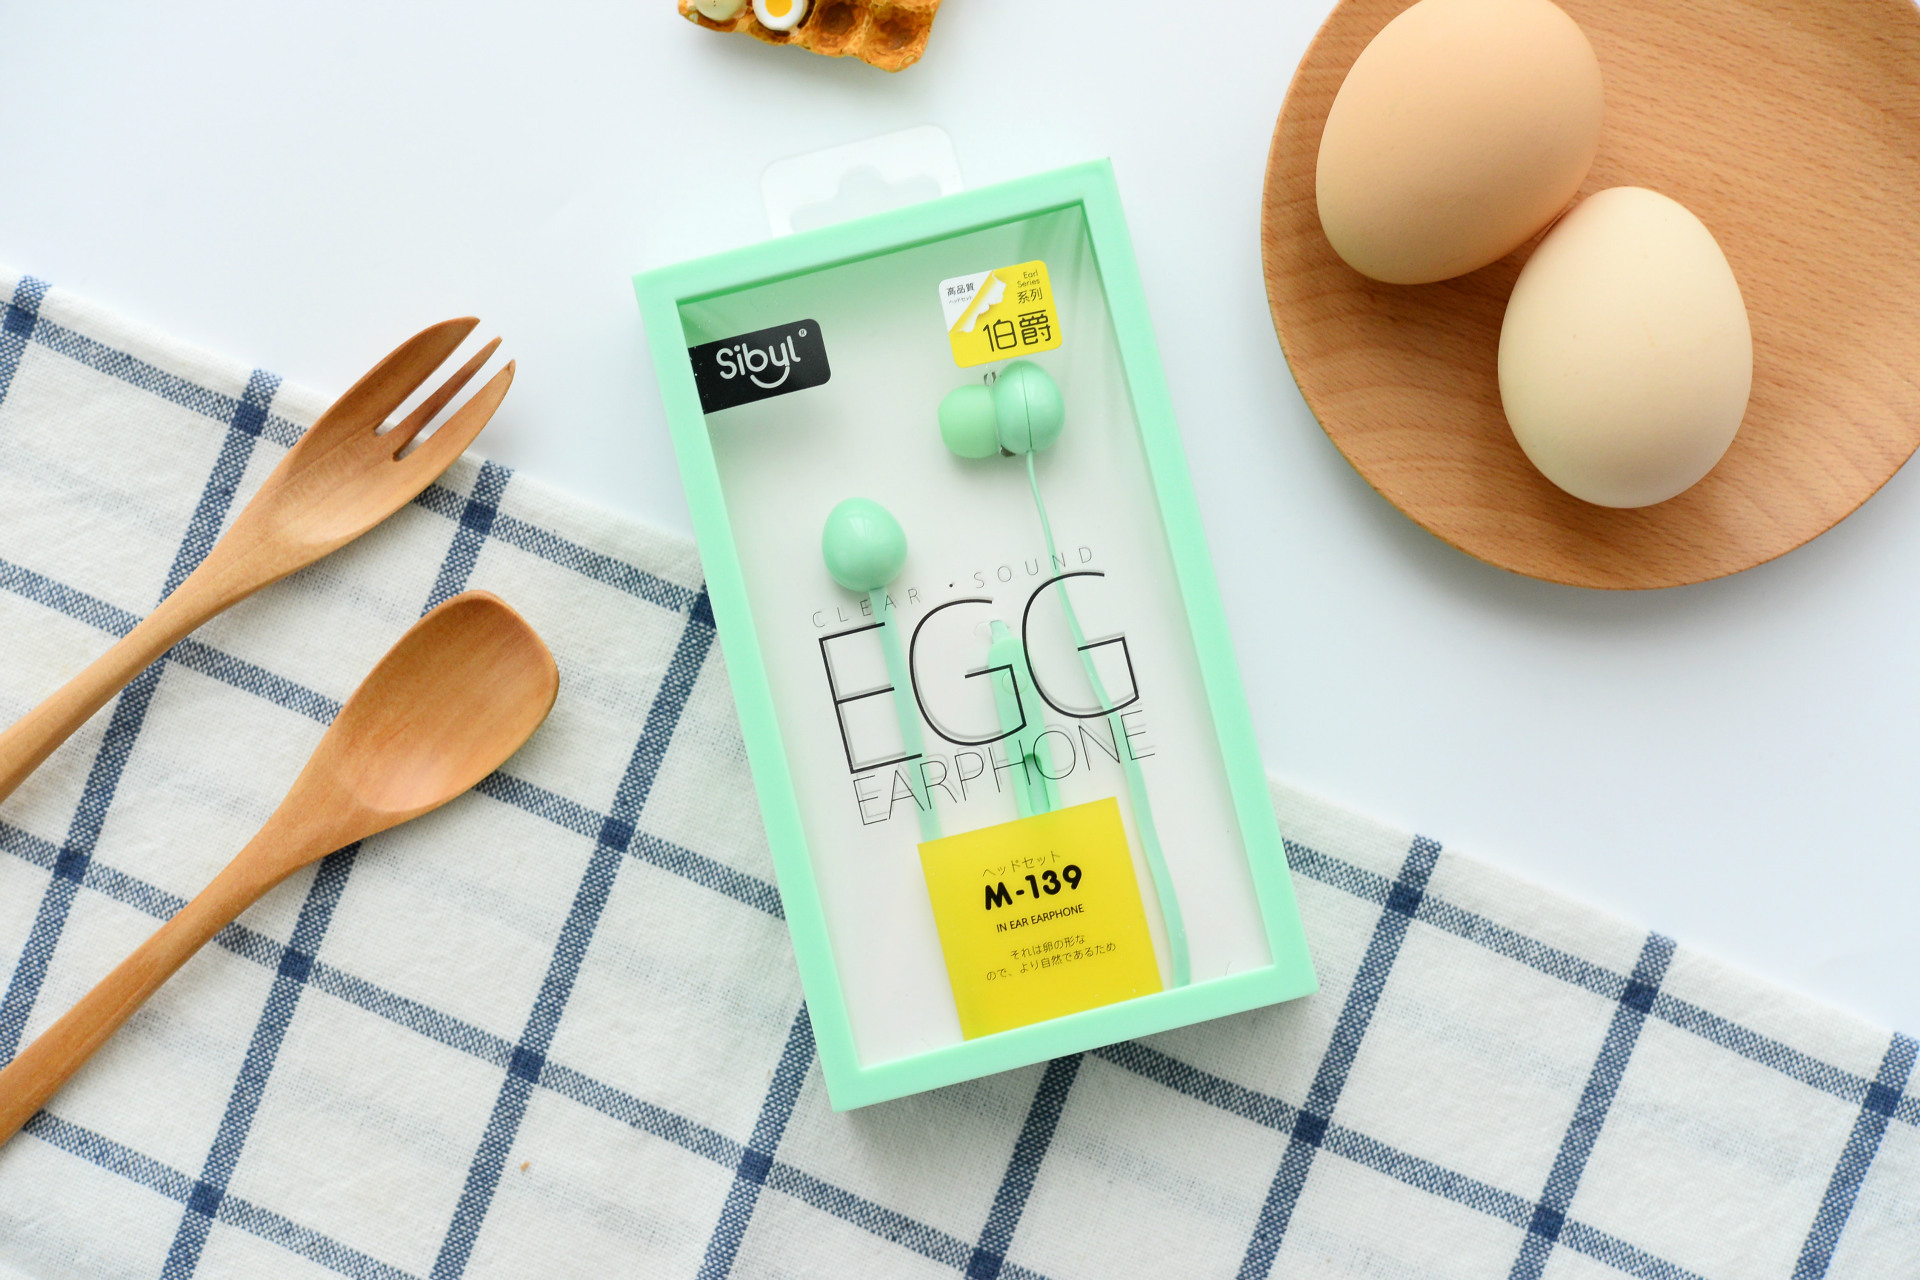 Наушники «Egg»